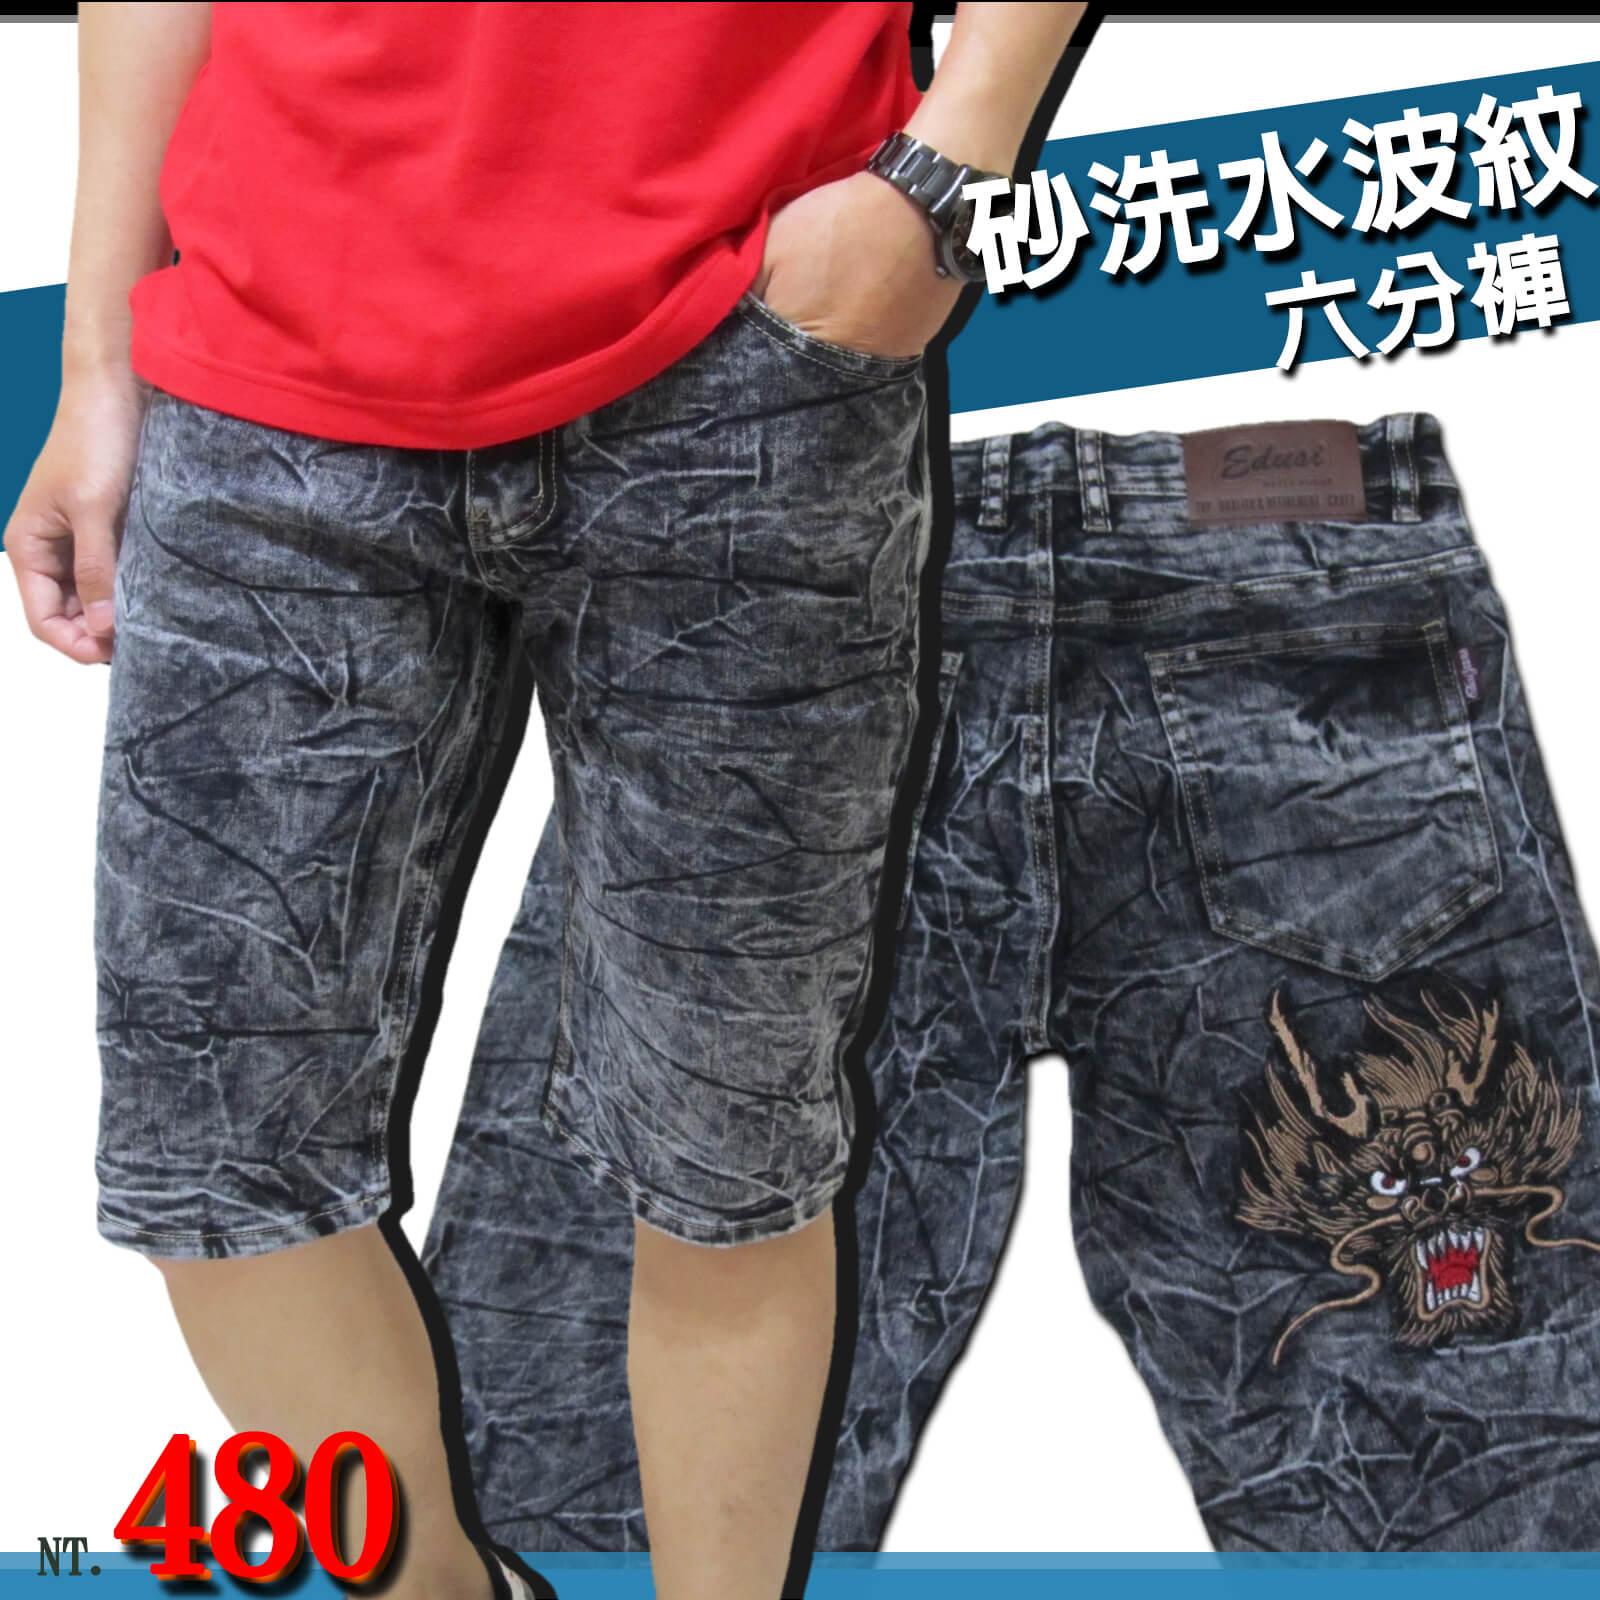 sun~e牛仔六分褲、繡龍頭圖樣、砂洗水波紋彈力六分褲、休閒牛仔褲、休閒六分褲、牛仔短褲、